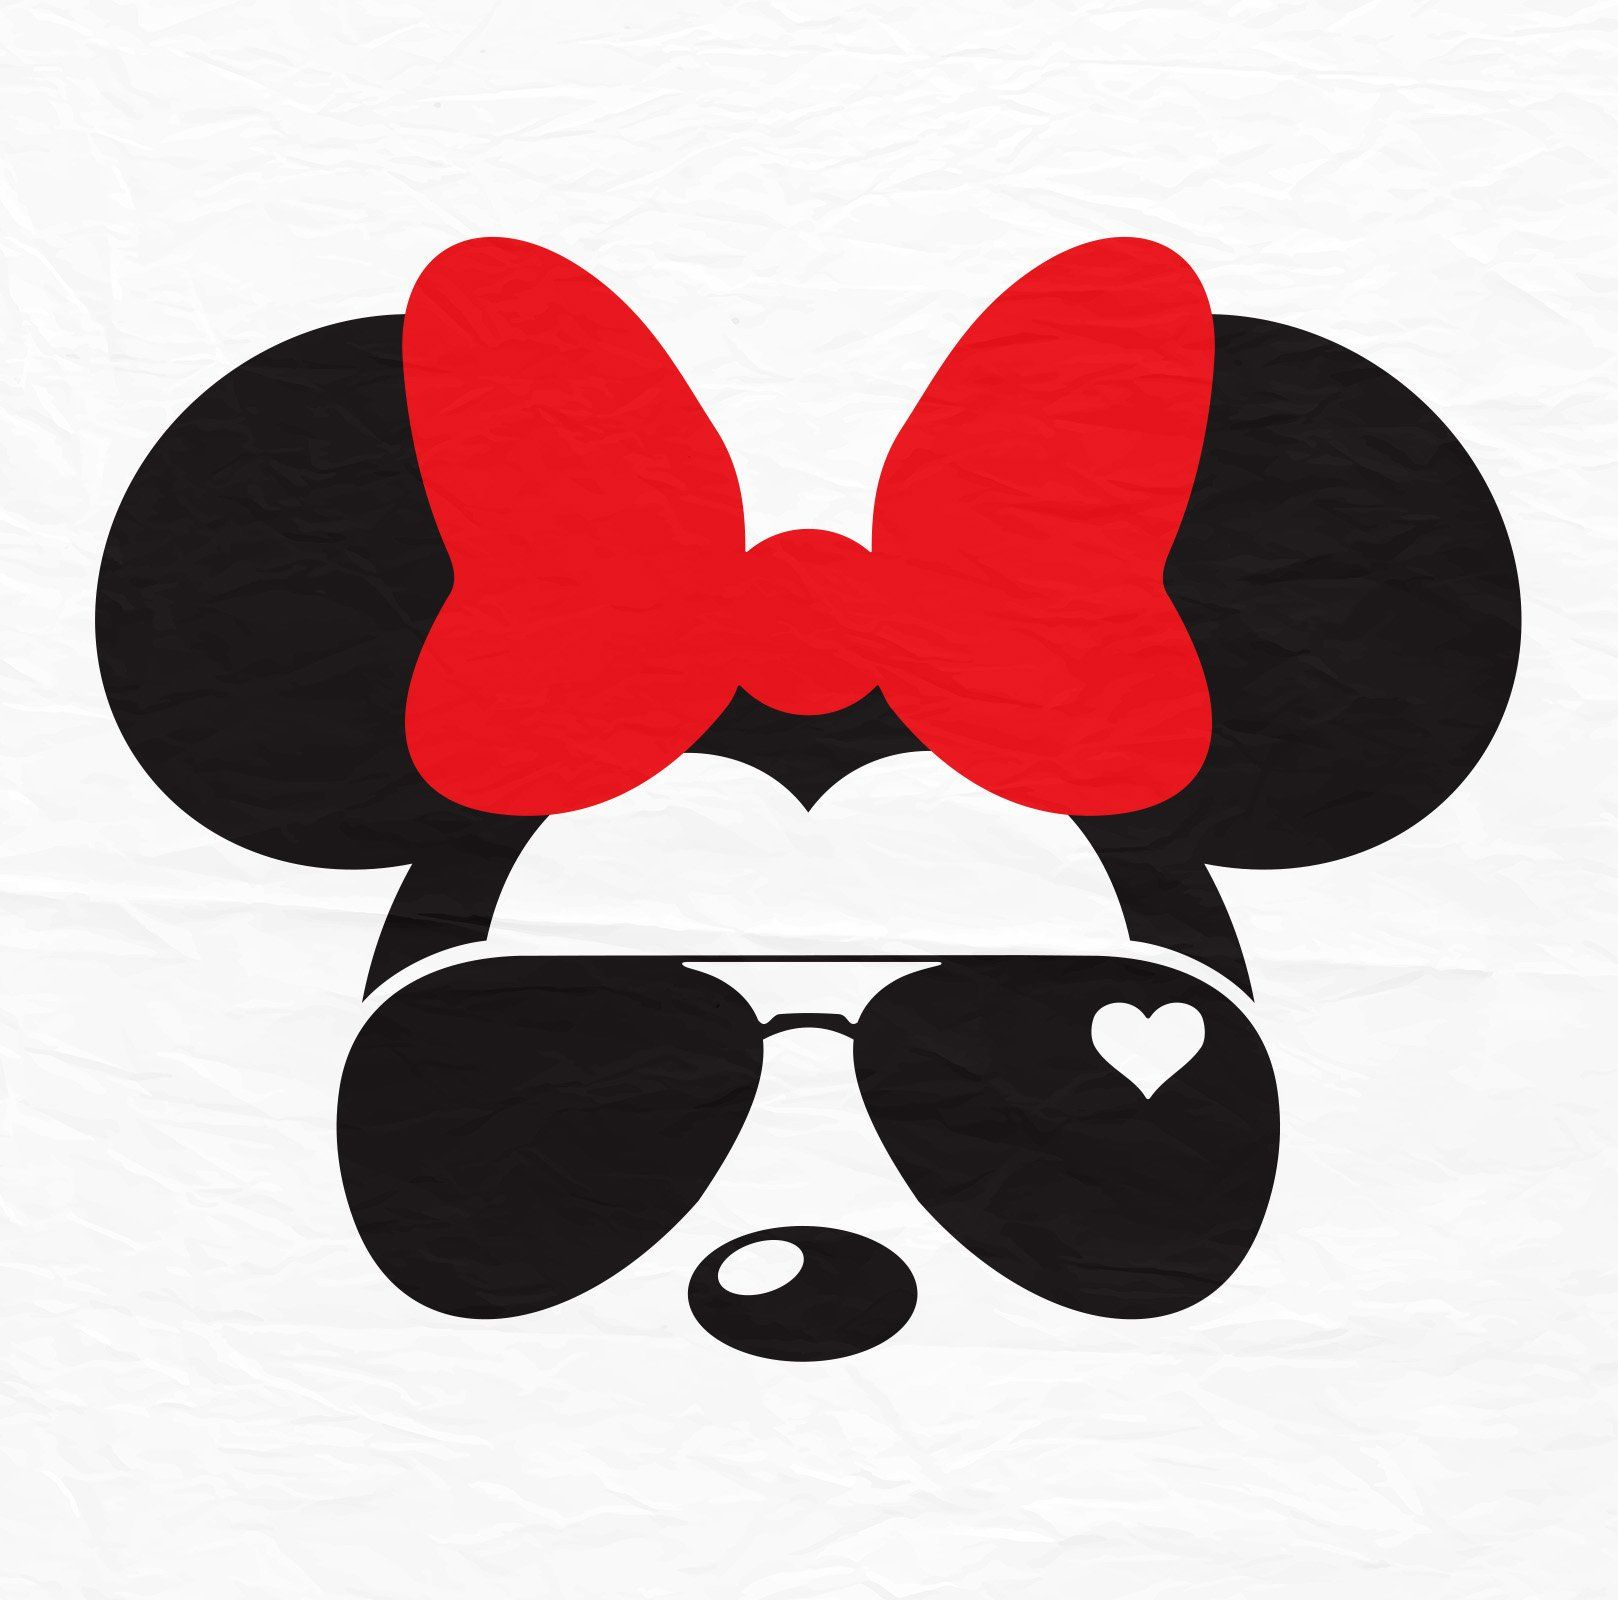 Clipart glasses minnie mouse. Disney mickey aviators sunglasses